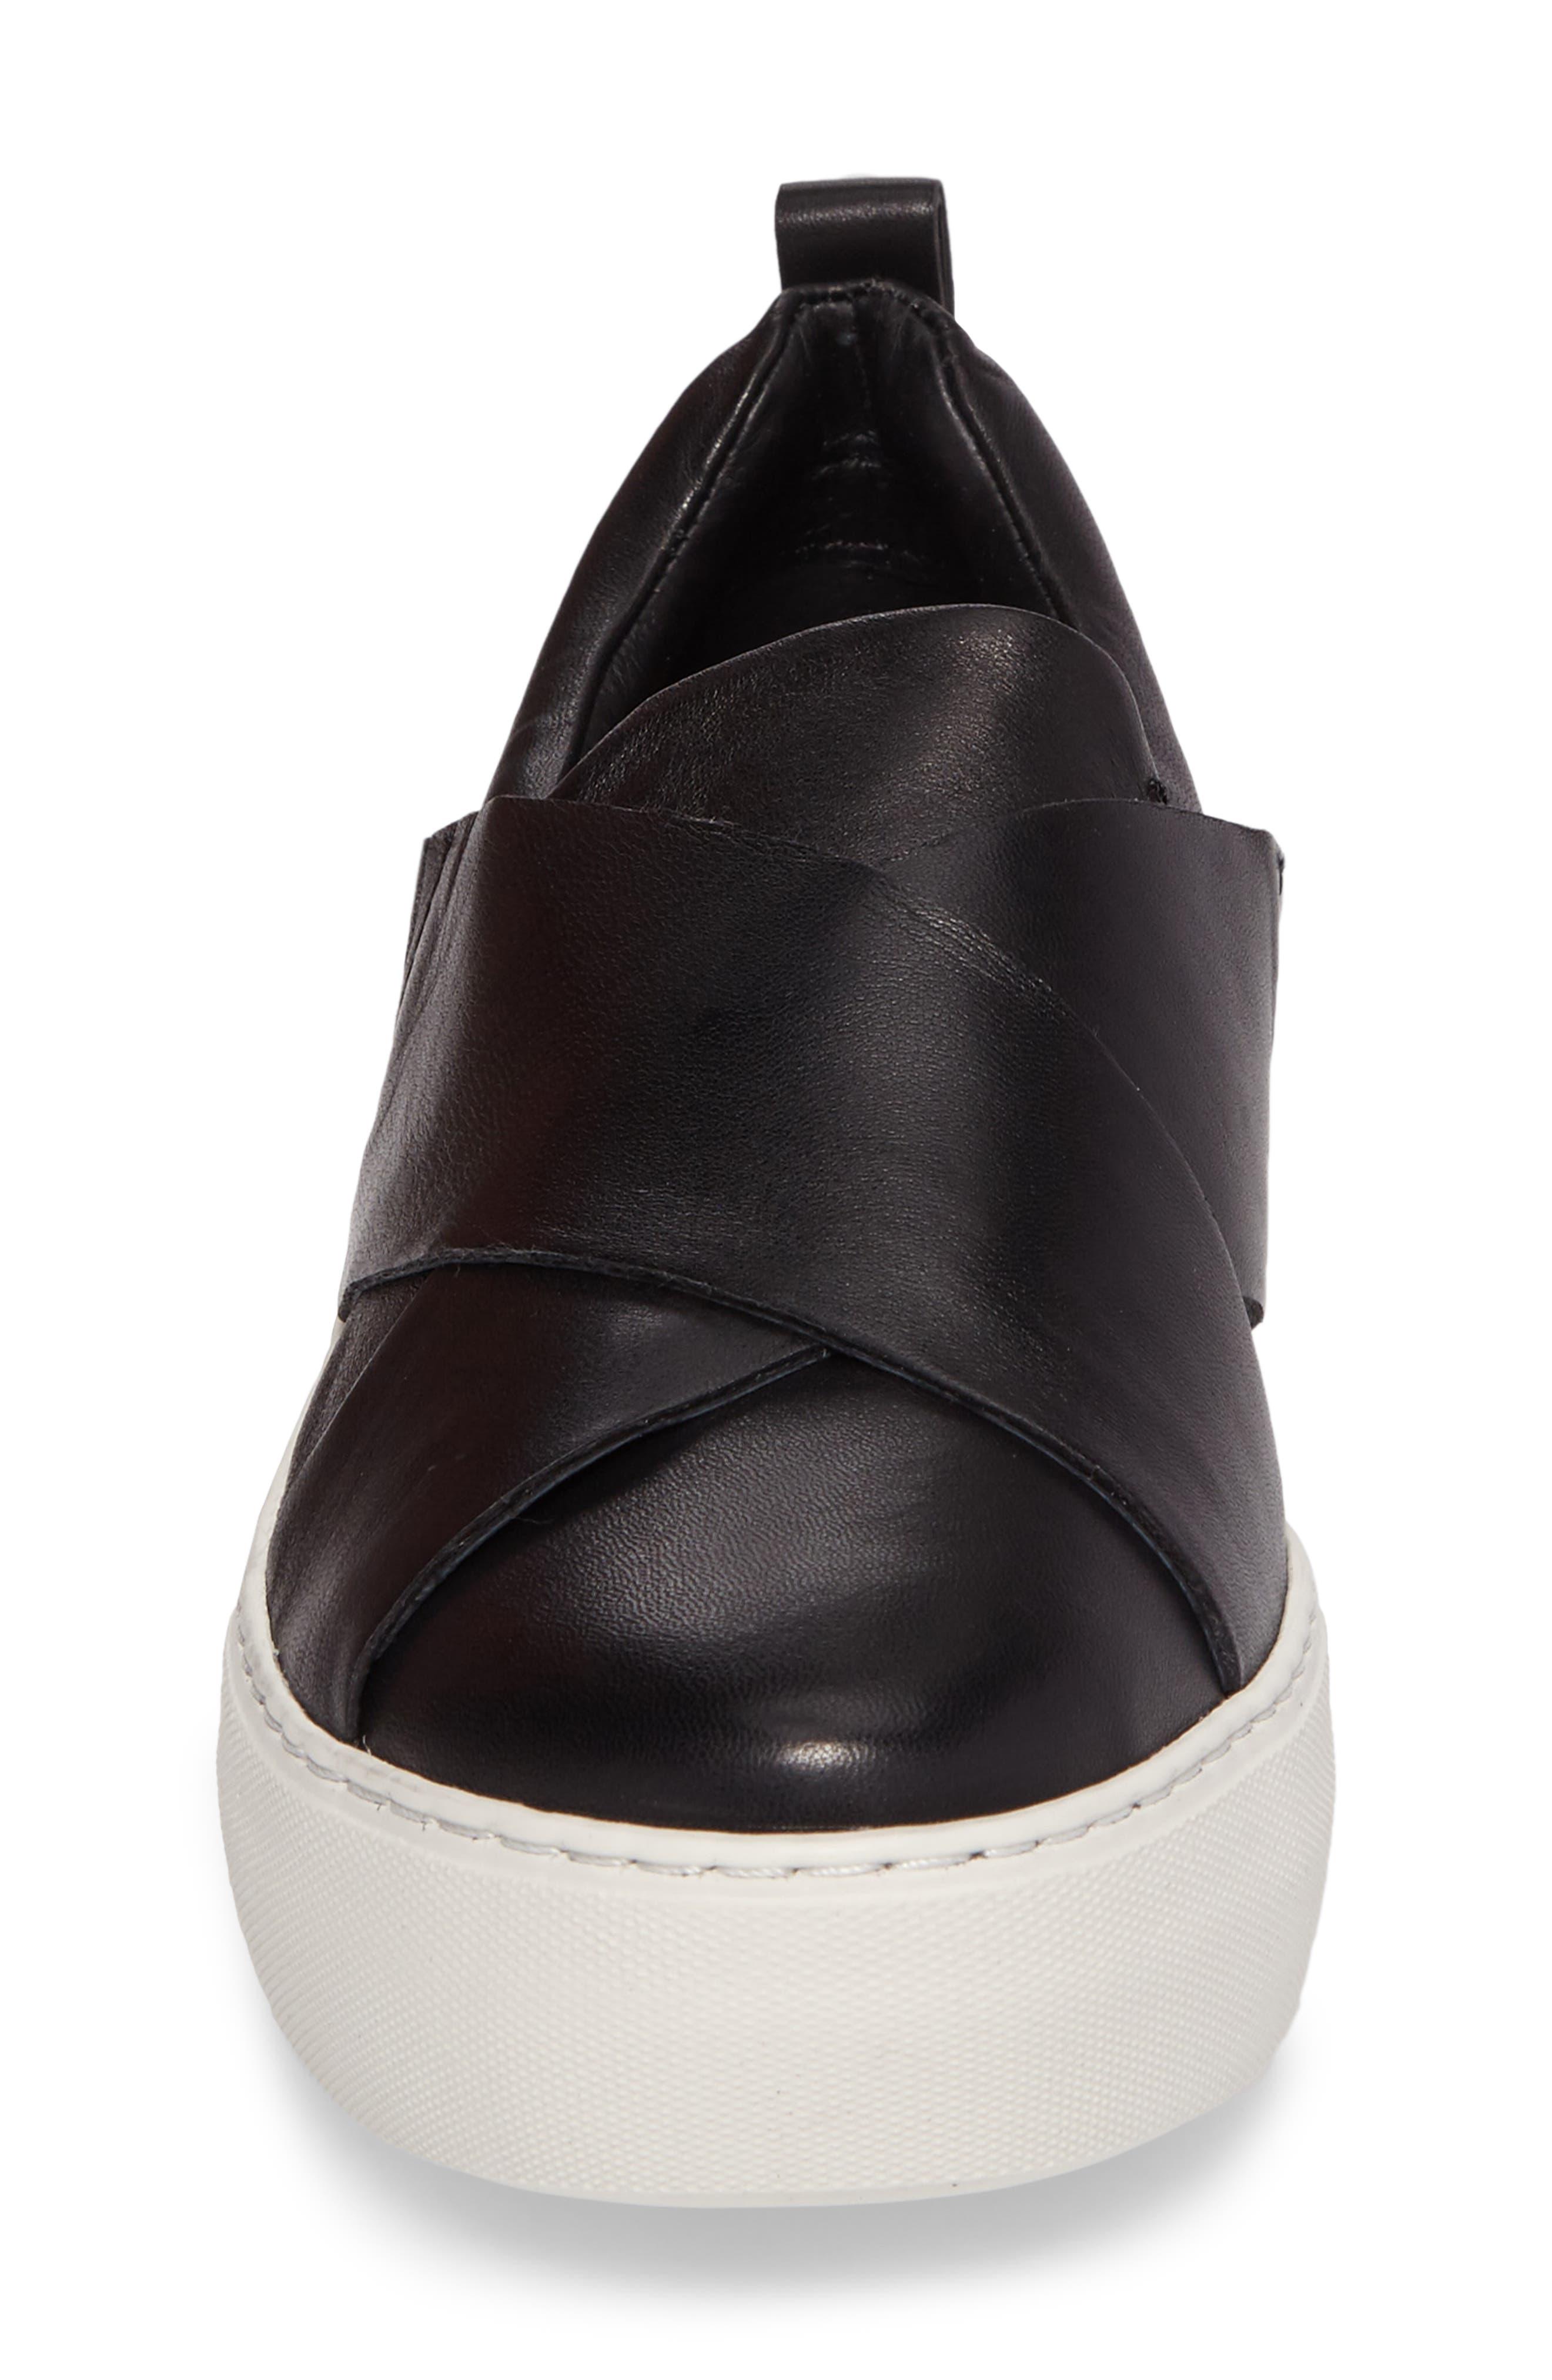 Alec Slip-On Sneaker,                             Alternate thumbnail 4, color,                             015